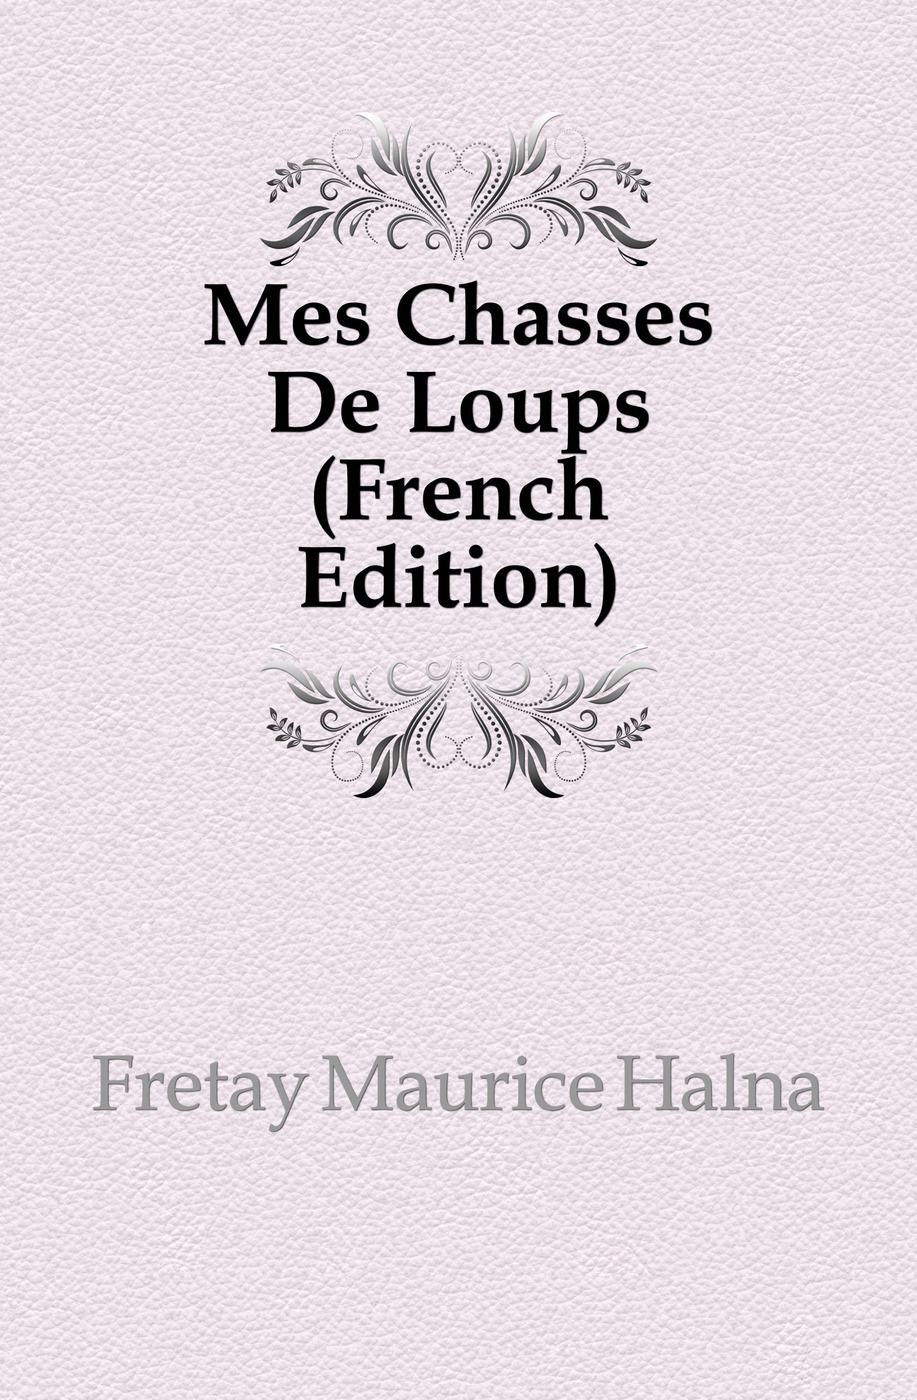 Fretay Maurice Halna Mes Chasses De Loups (French Edition) александр дюма le meneur de loups french edition